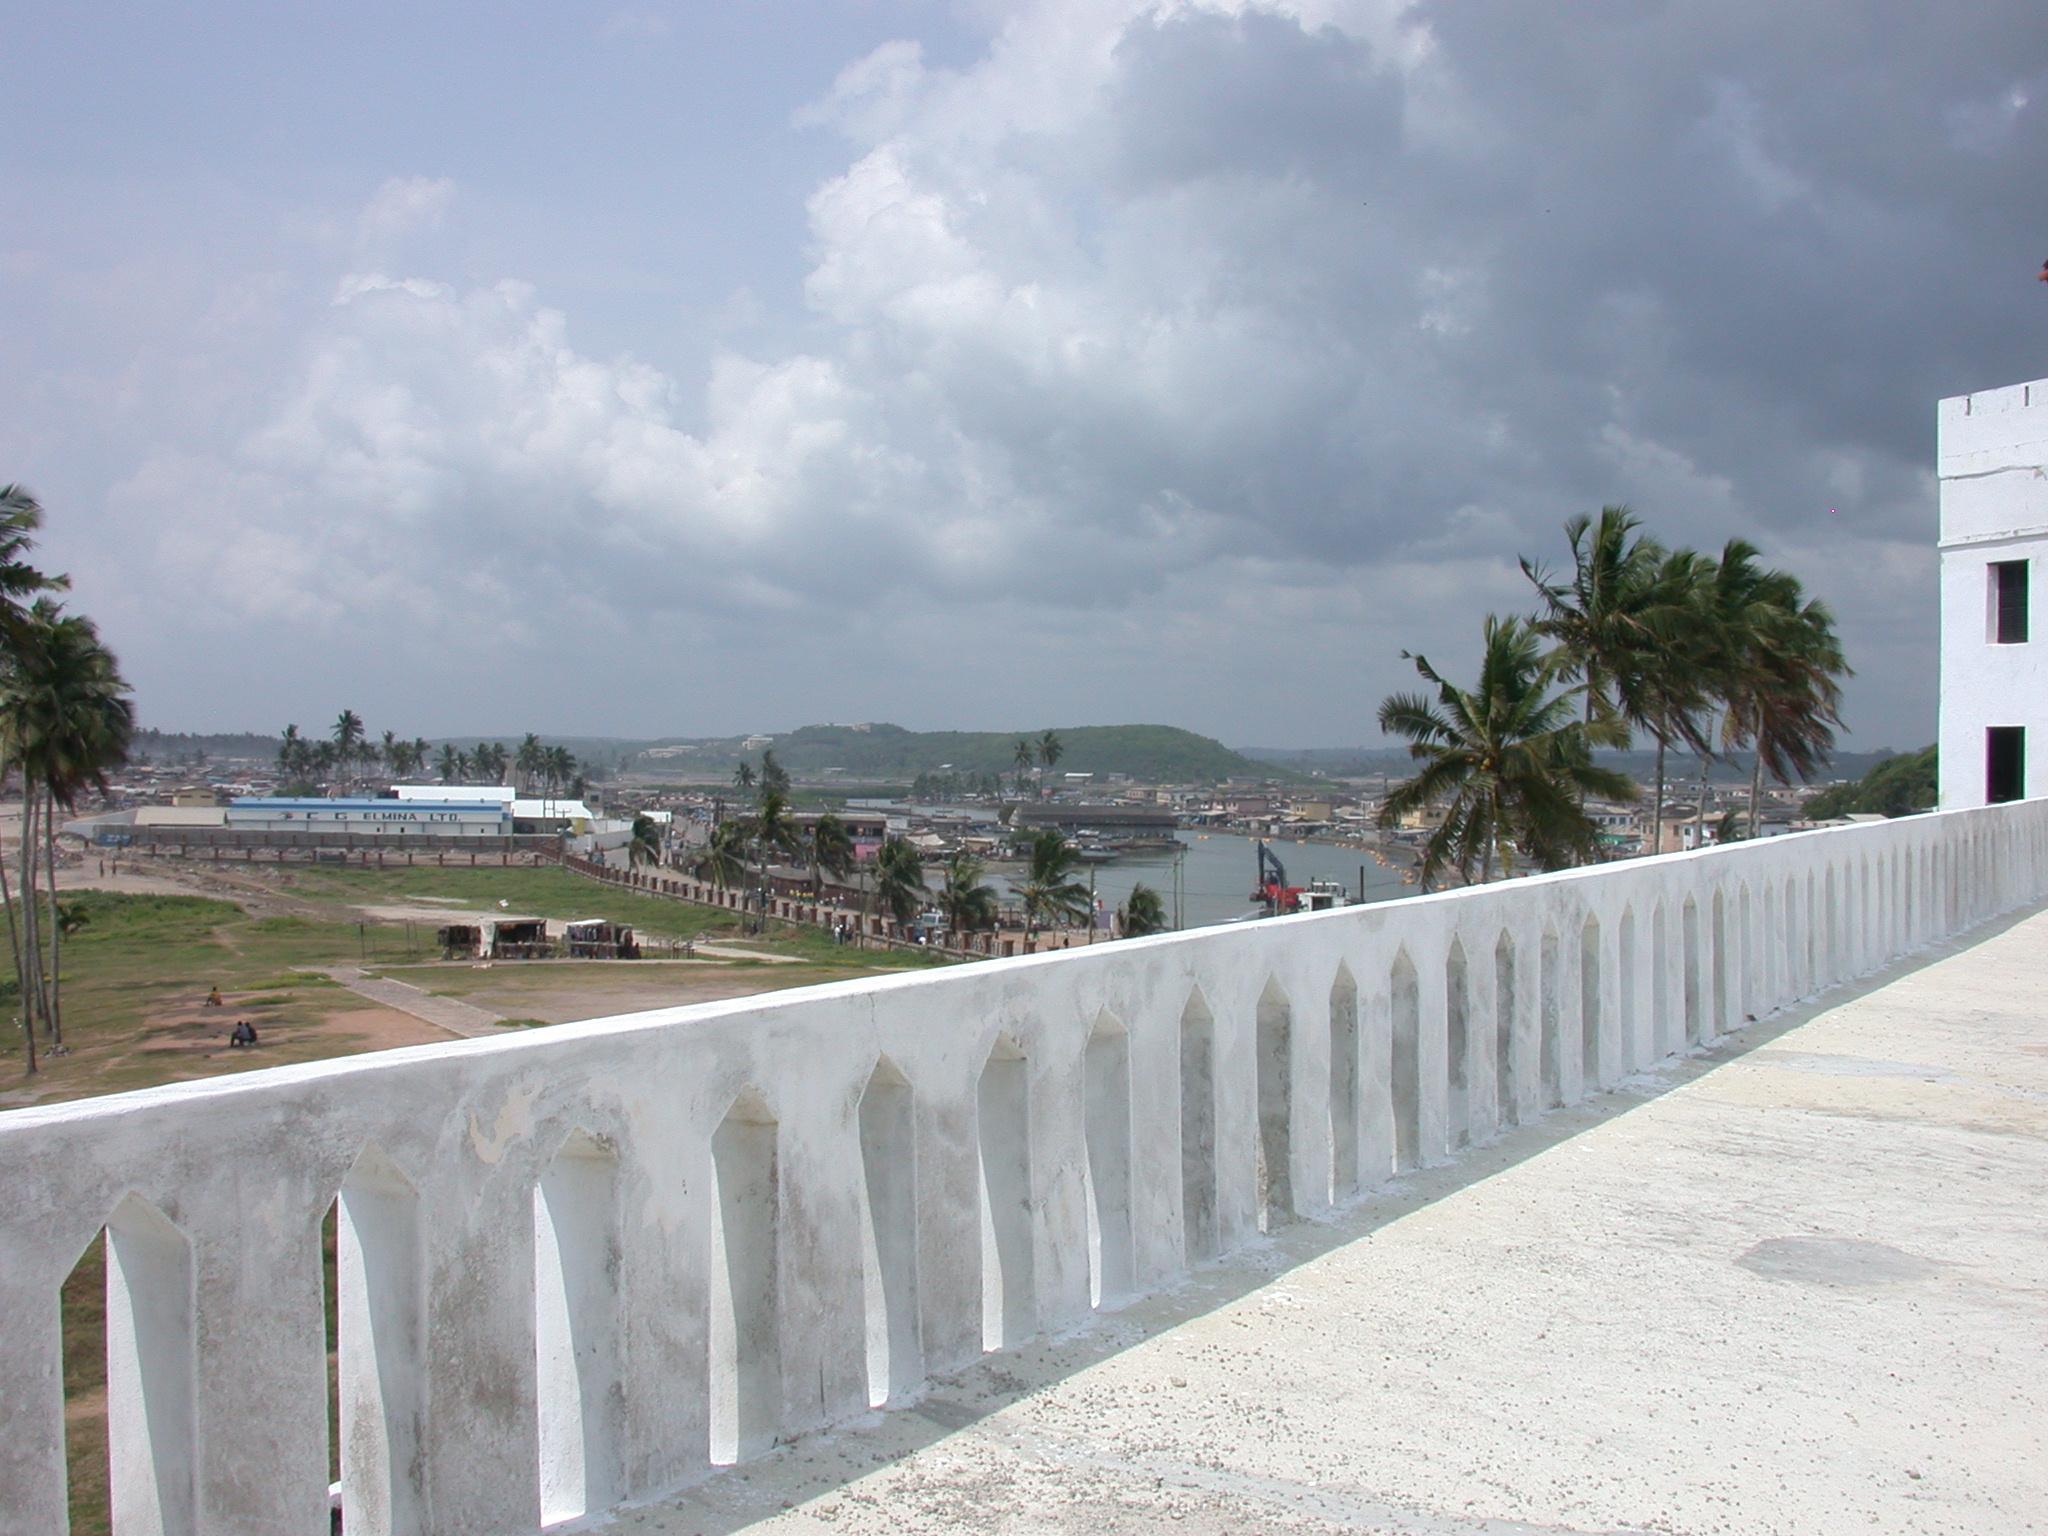 Inland View From Upper Level Roof Terrace, Elmina Slave Fort, Elmina, Ghana